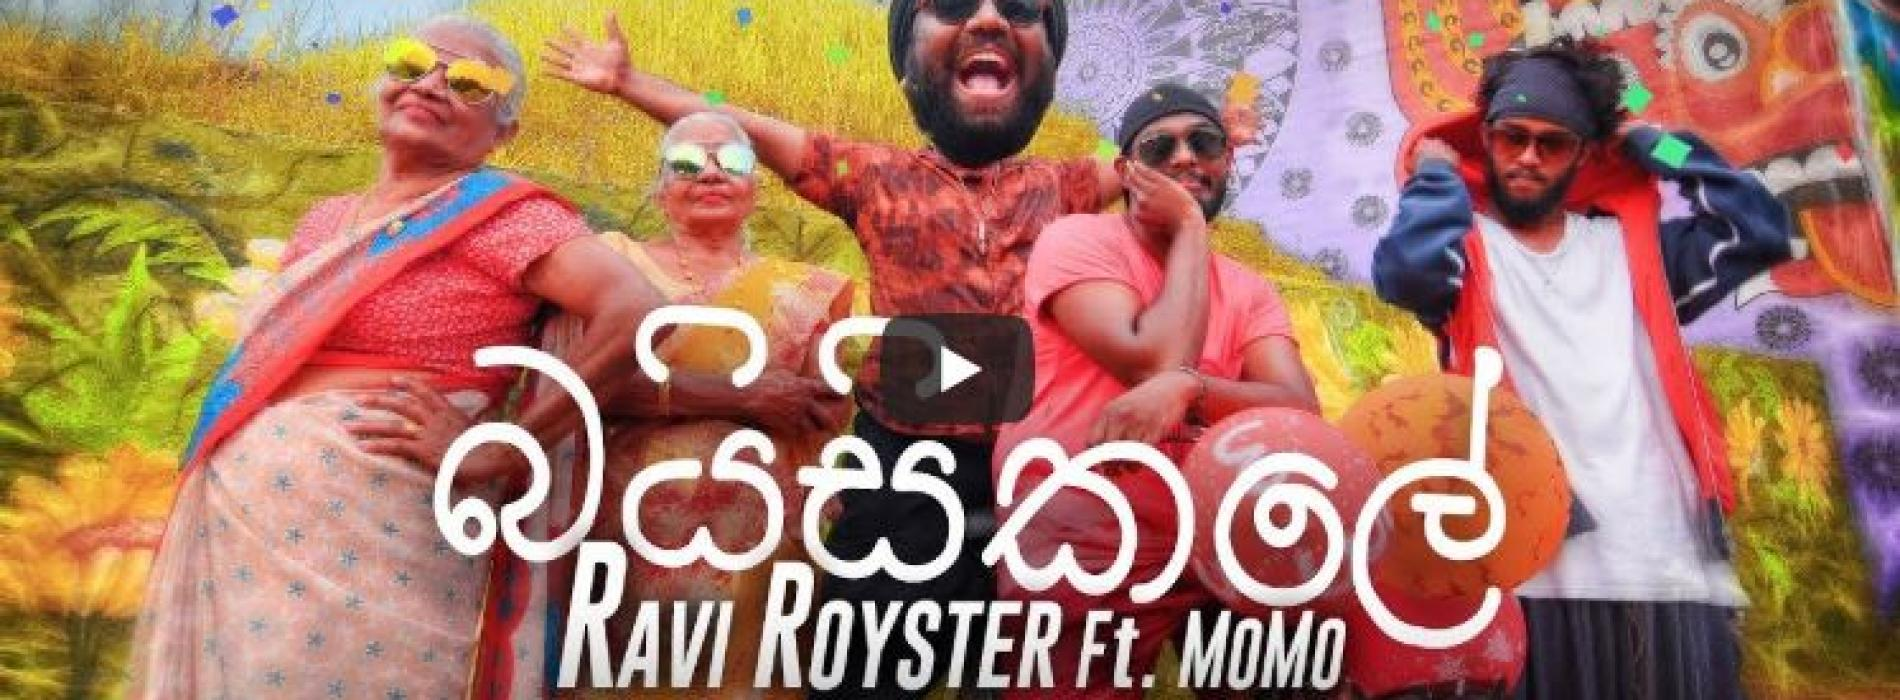 Ravi Royster – Bicycalae බයිසිකලේ Official Music Video